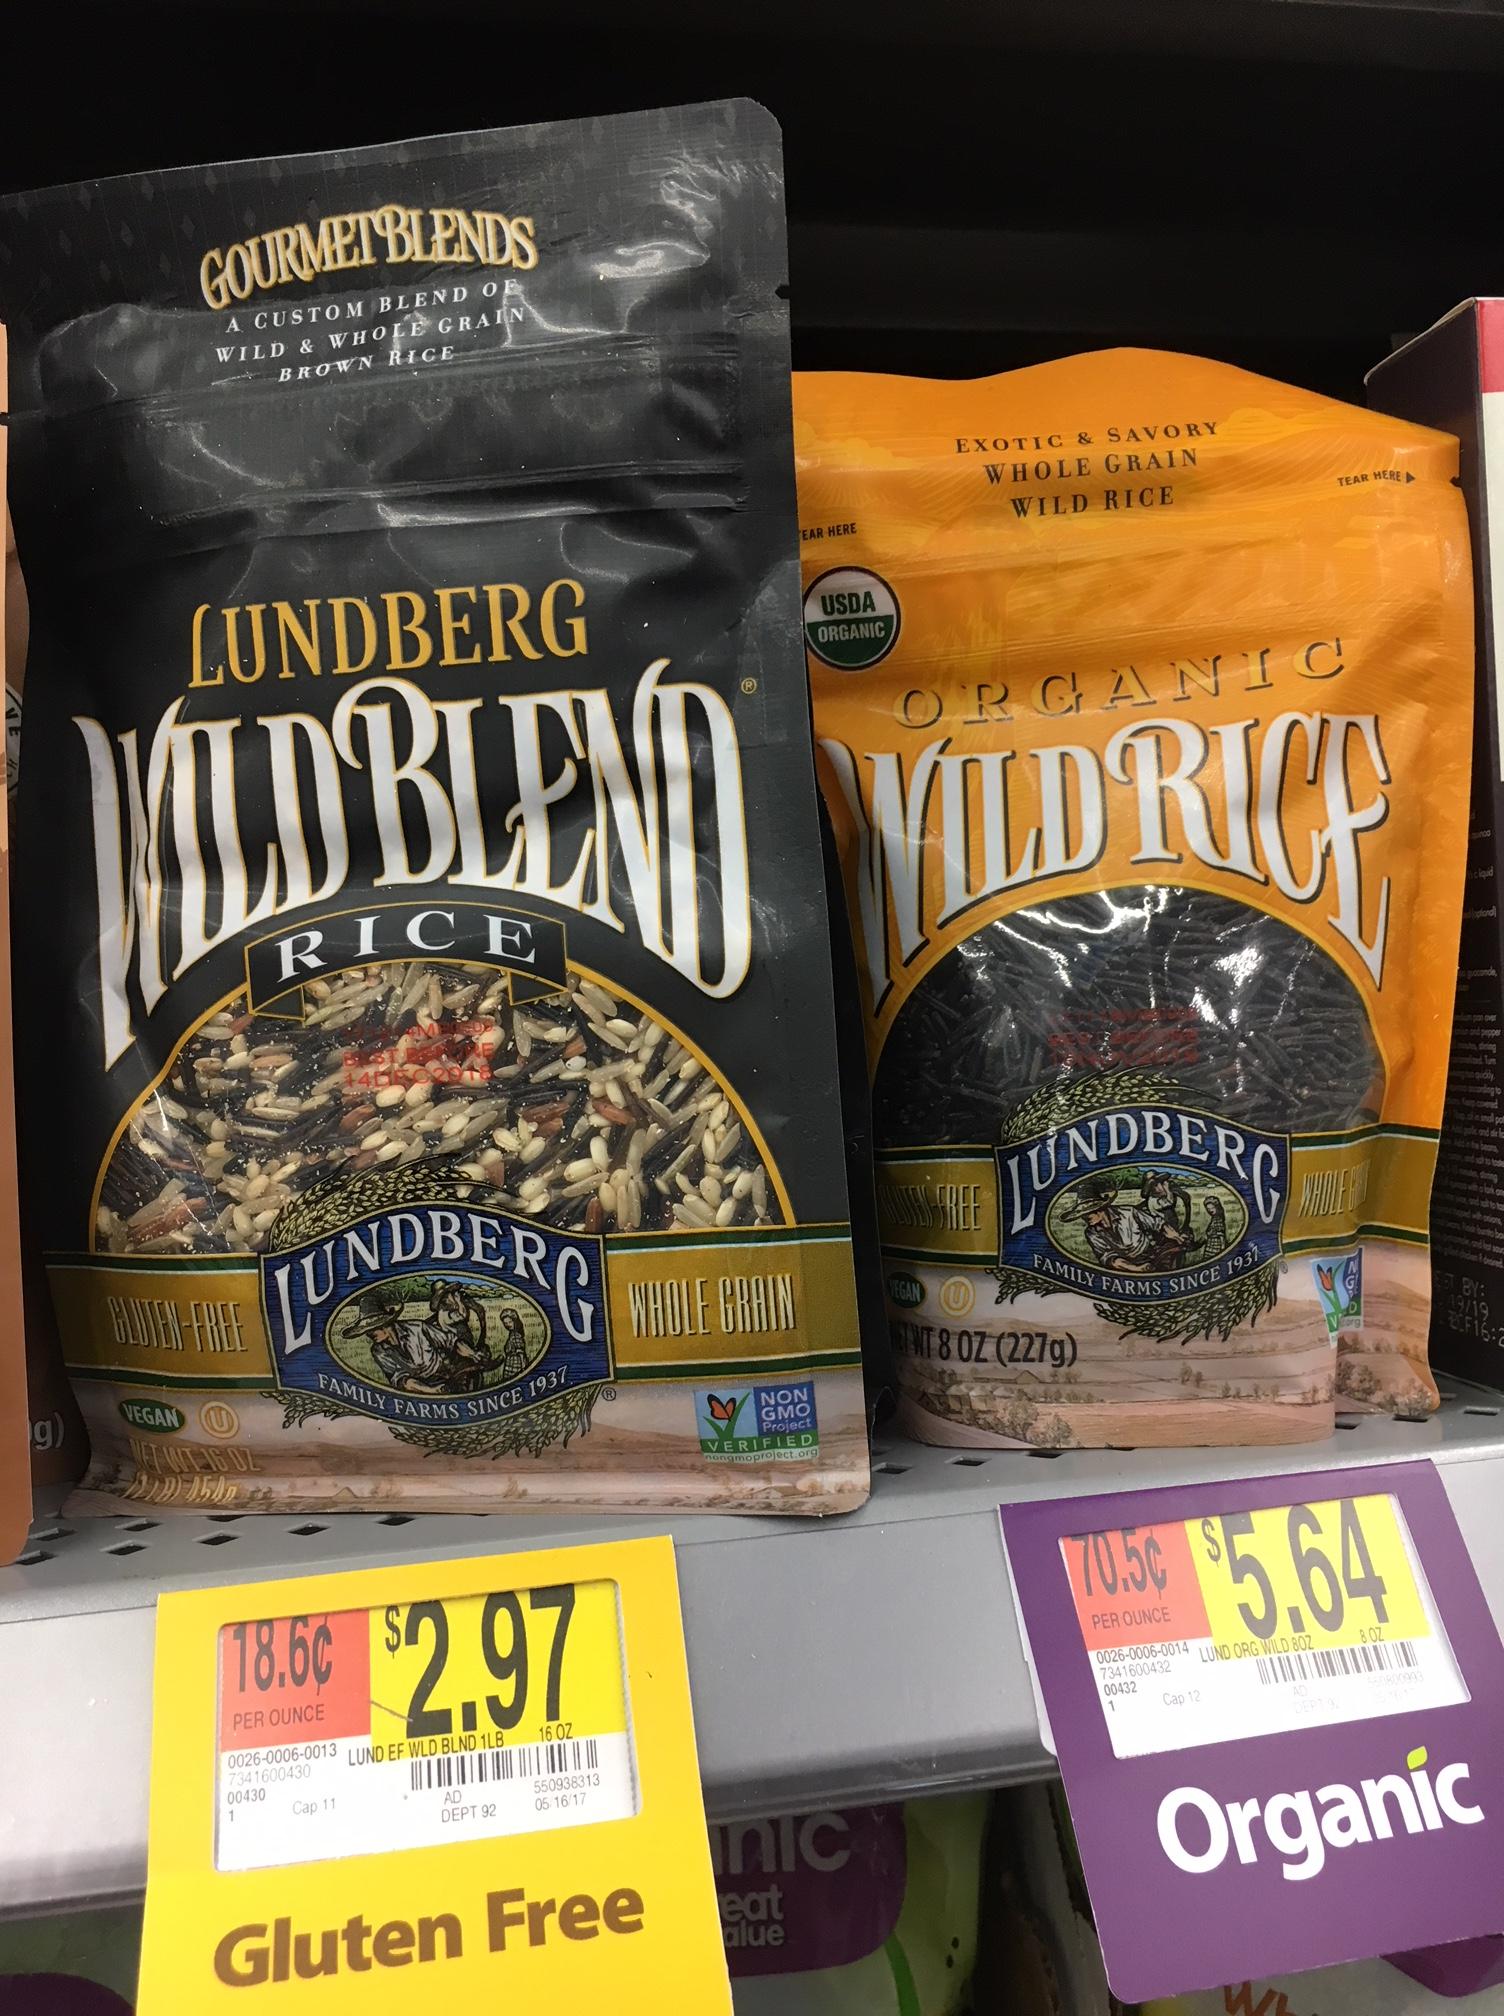 Lundberg products at walmart